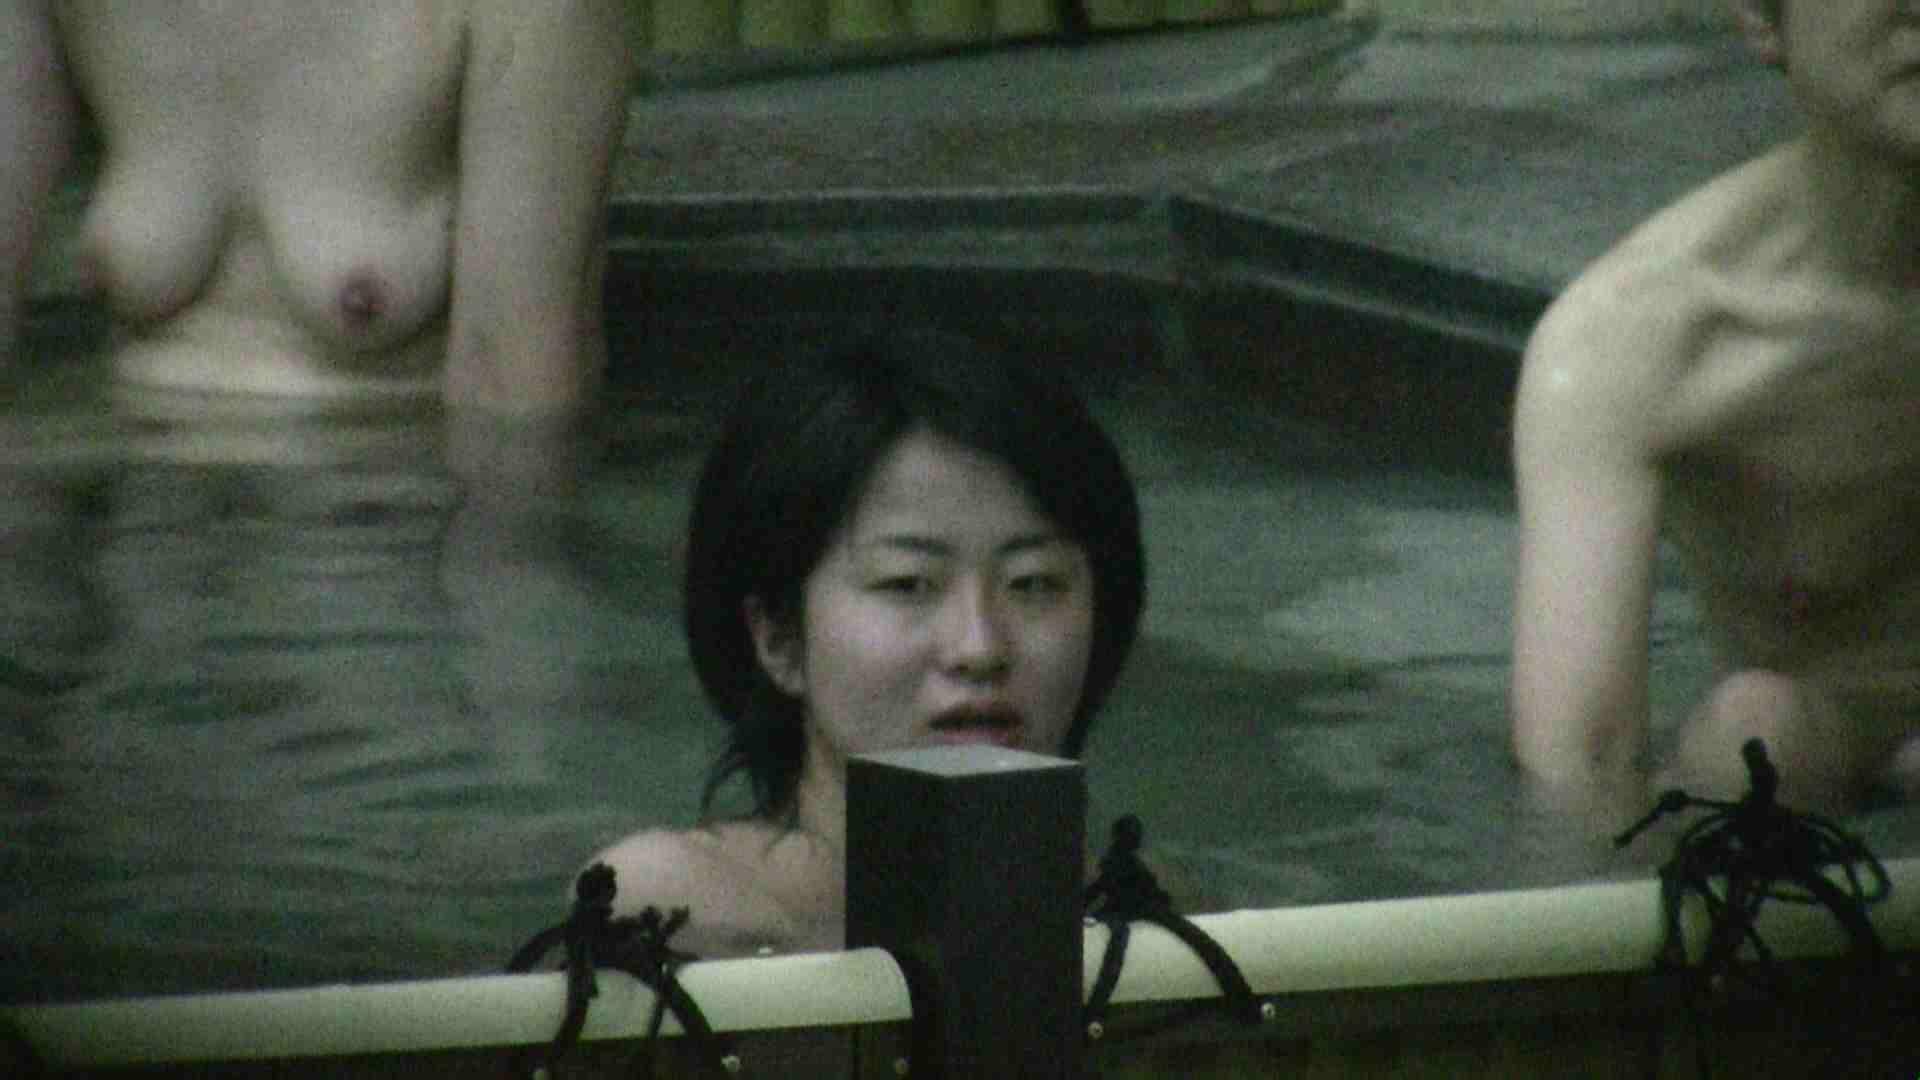 Aquaな露天風呂Vol.112 盗撮シリーズ   露天風呂編  93PIX 87